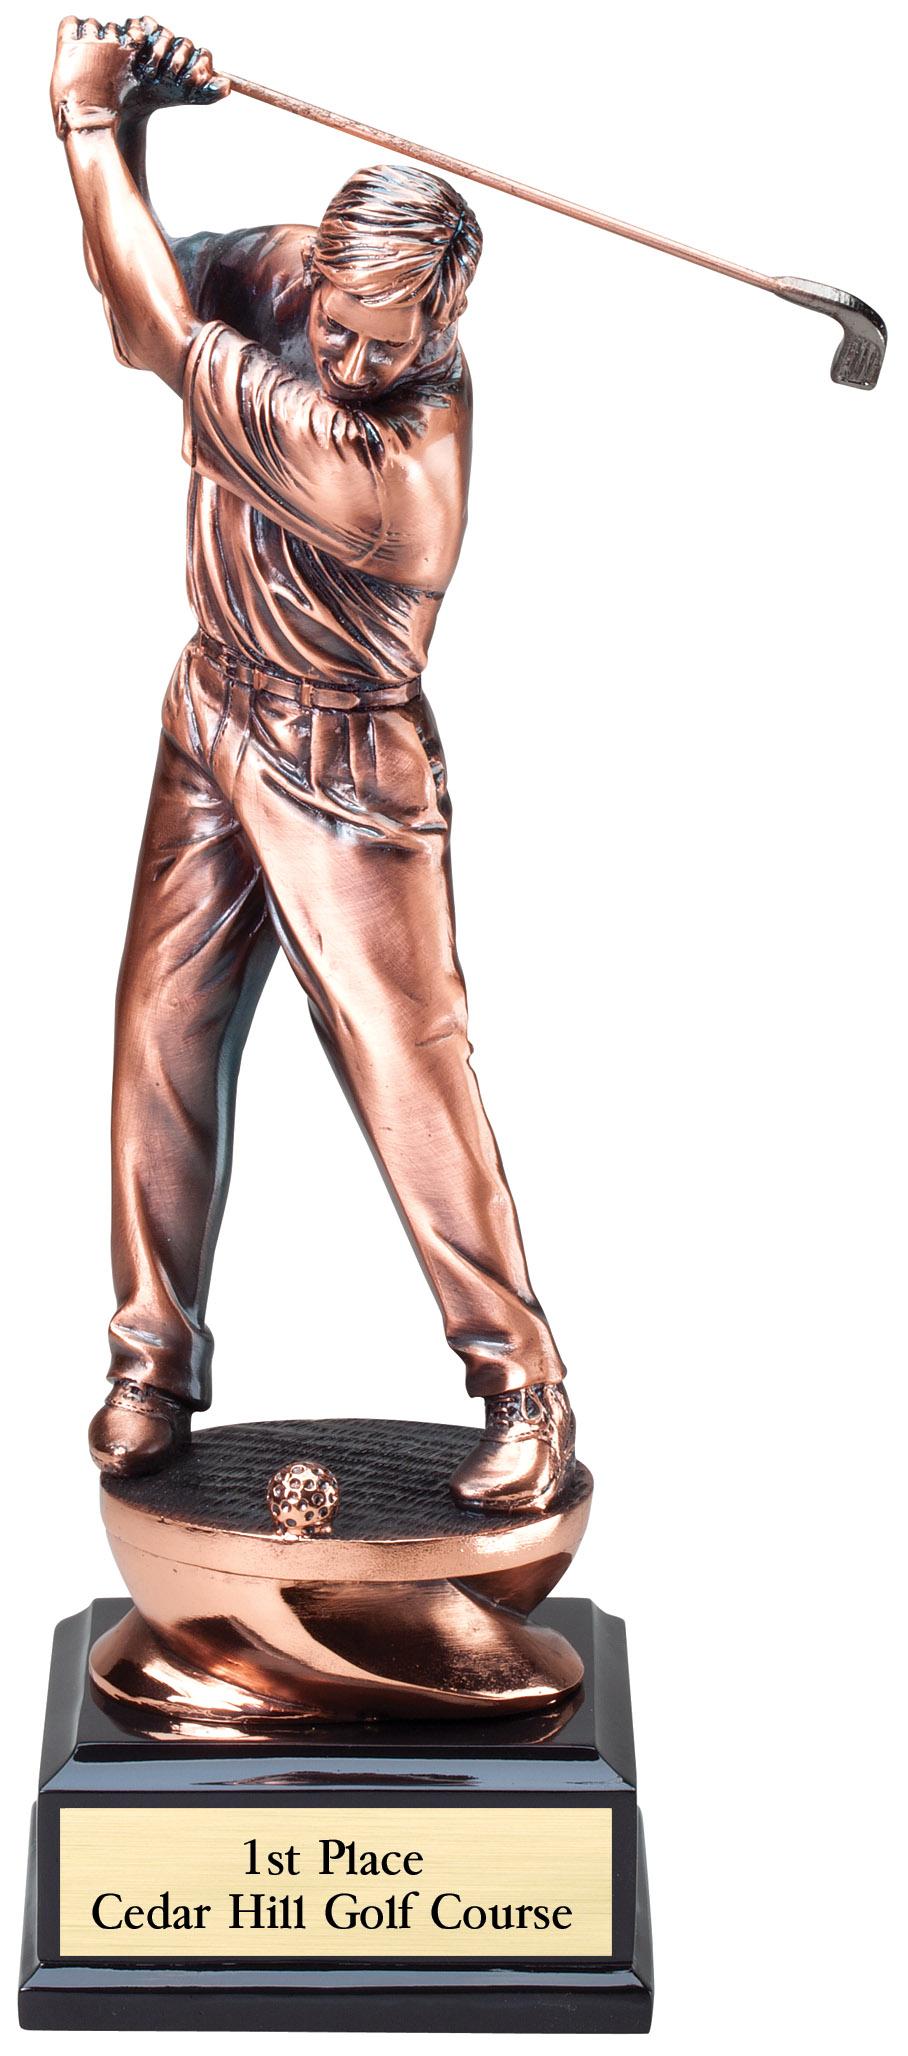 "Copper Finish - Driver, Male    Large:  G1503 - 11"" tall -  $54    Medium:  G1502 - 9.25"" tall -  $47    Small:  G1501 - 8.25"" tall -  $37"